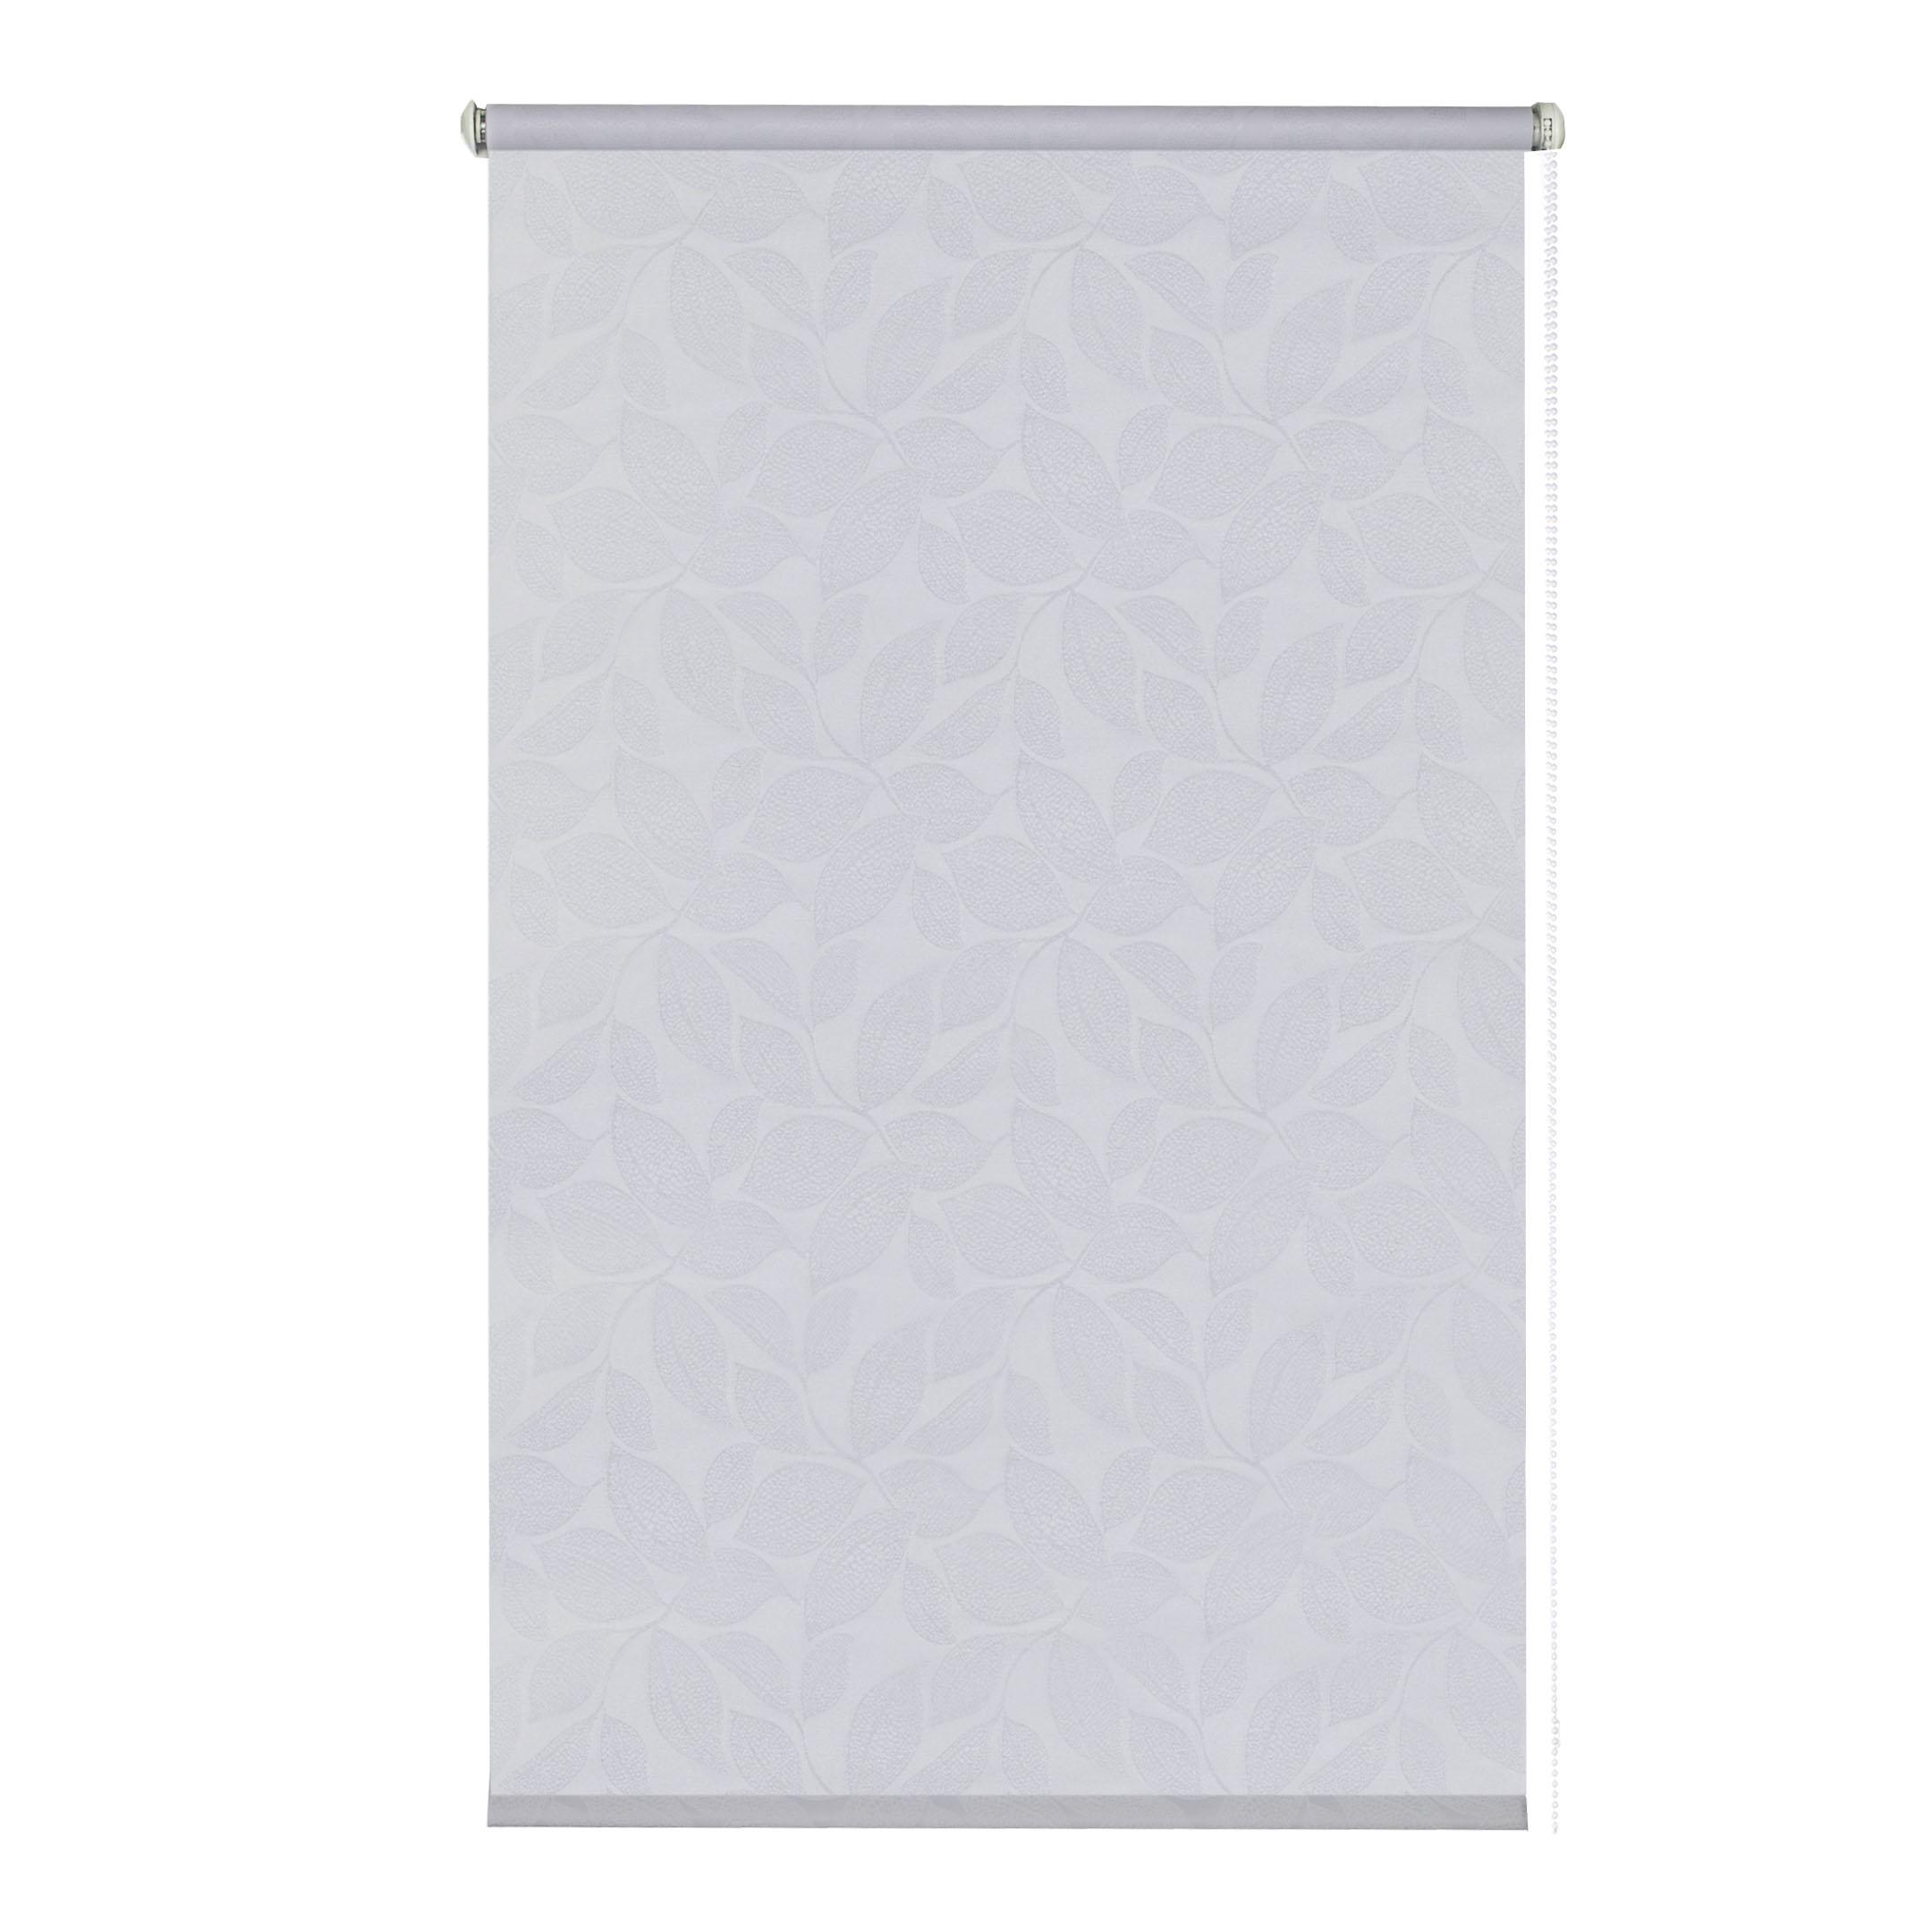 Штора рулонная Лиаф 60х160 см белый